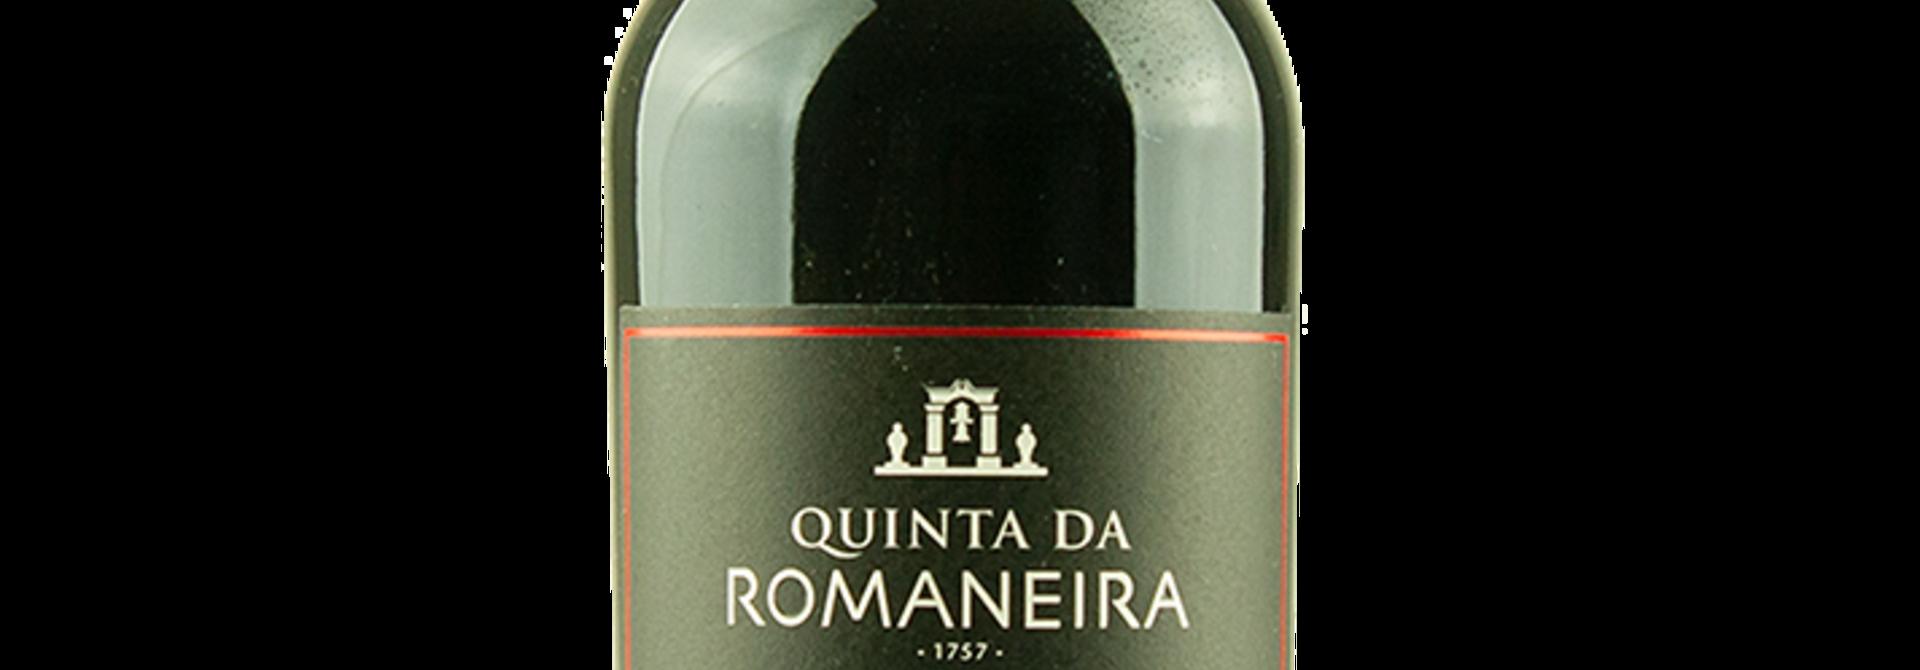 Quinta da Romaneira Vintage Port 2015